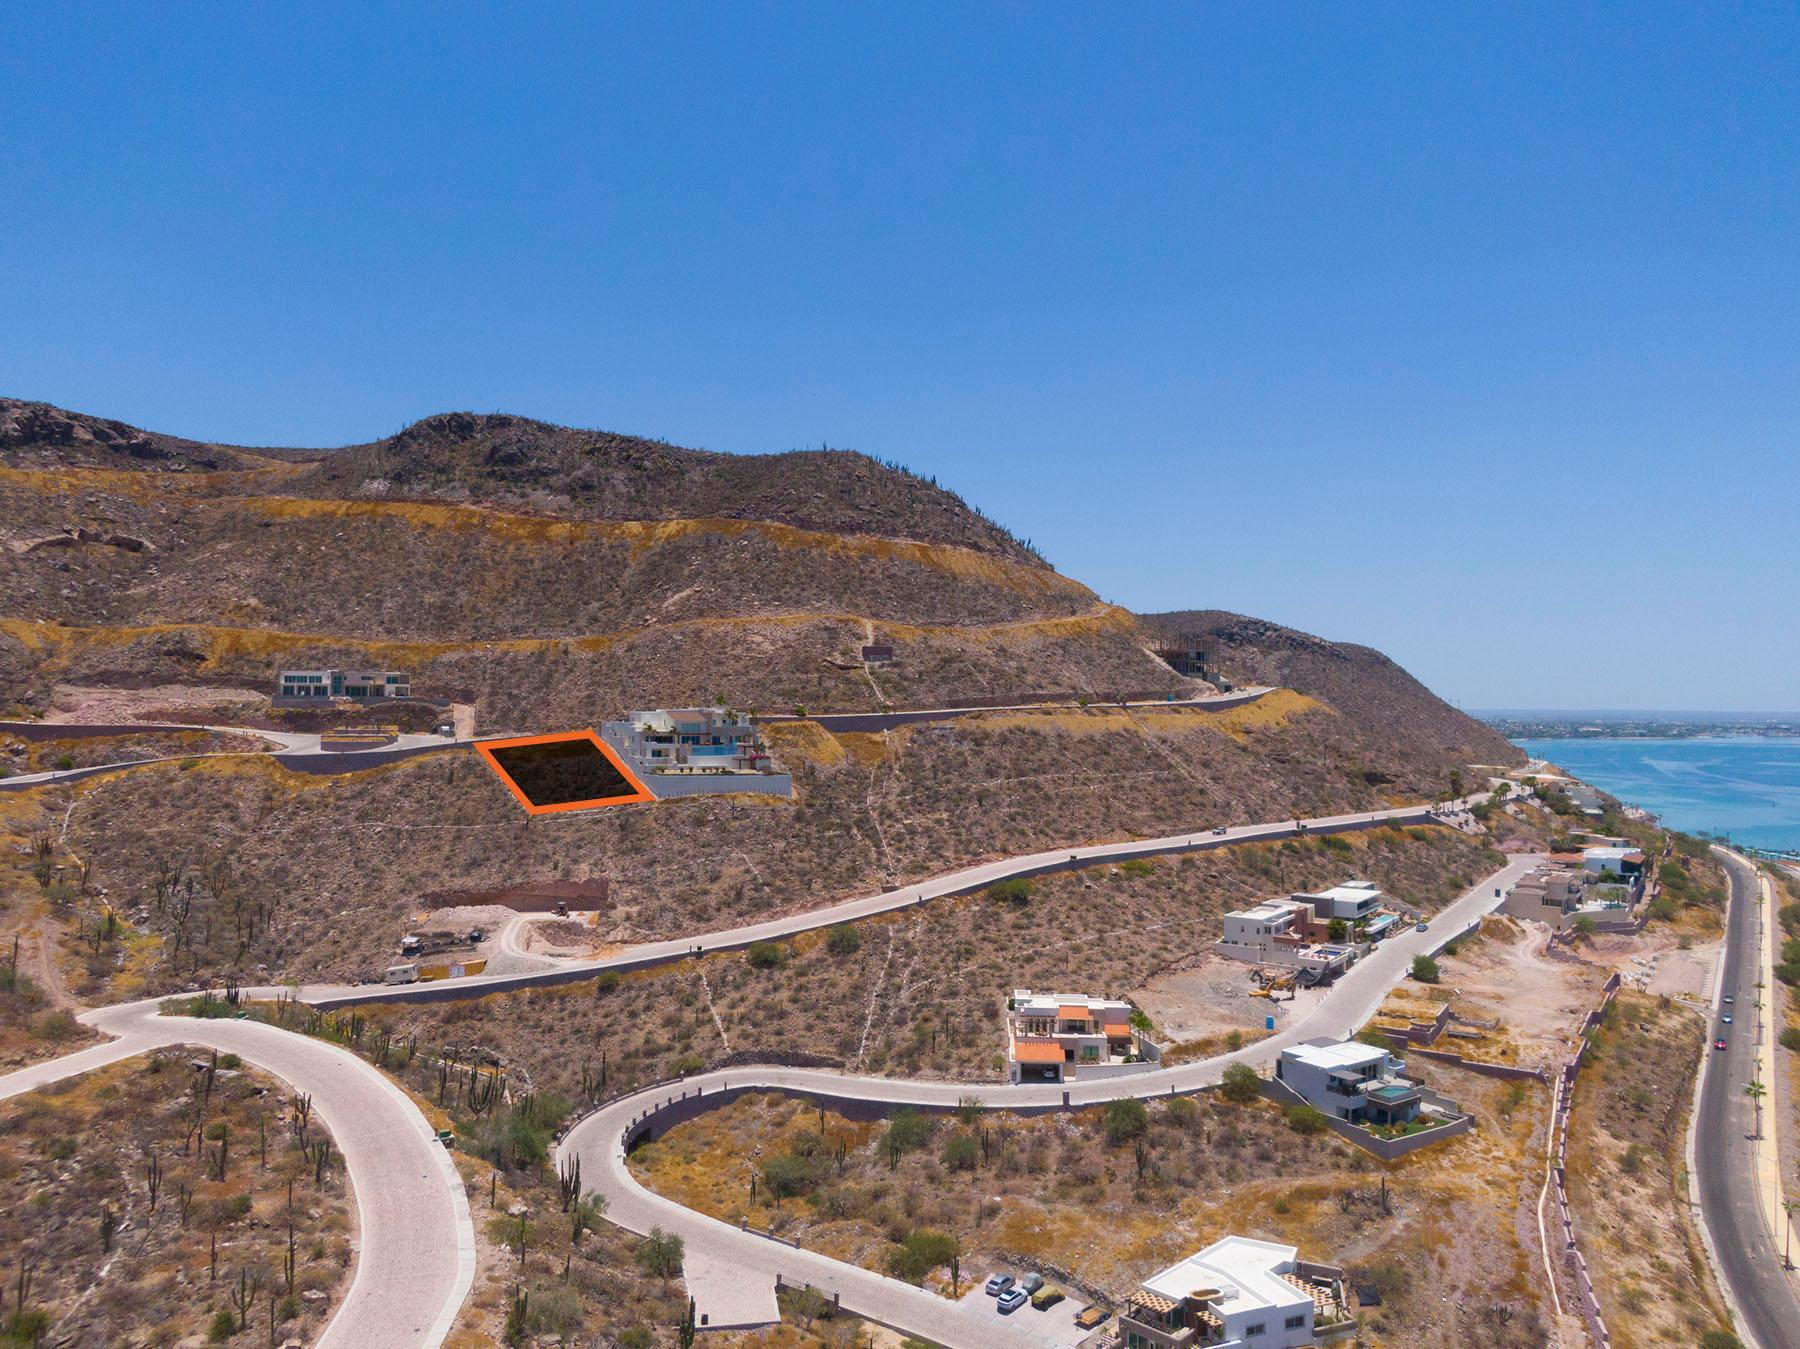 Lot 4/3 Bahia Pichilingue